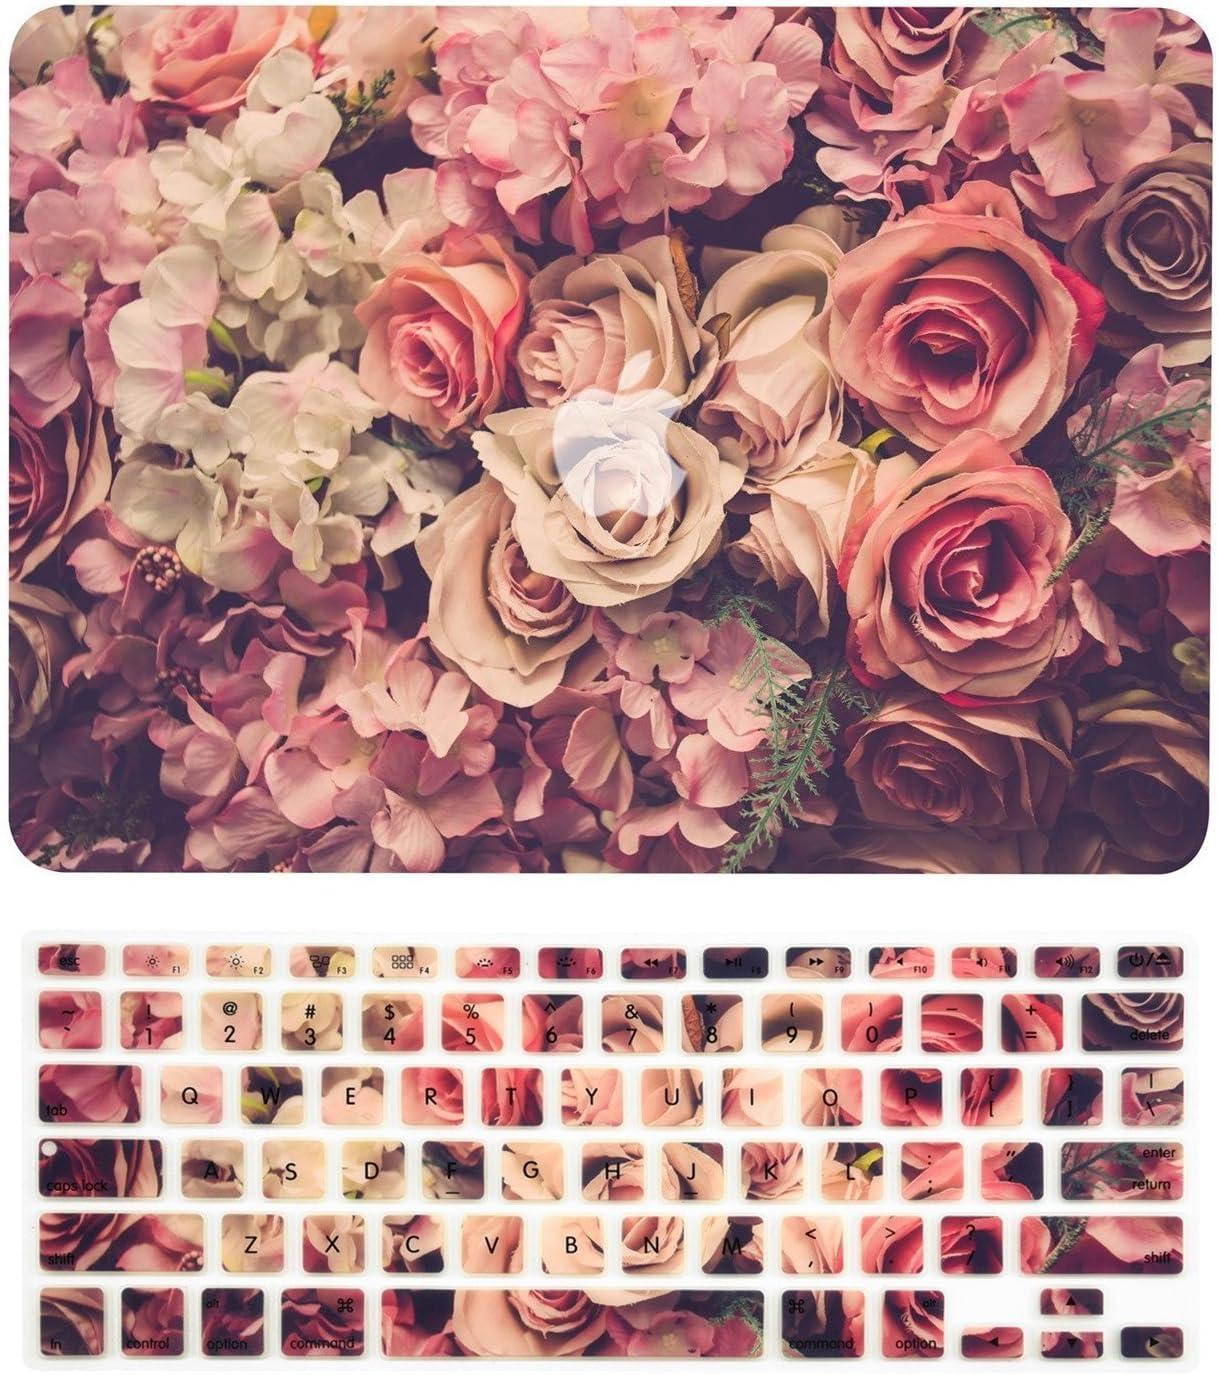 "TOP CASE - 2 in 1 Signature Bundle Floral Pattern Matte Hard Case + Keyboard Cover Compatible MacBook Air 13"" (13"" Diagonally) A1369 / A1466 (Older Version, Release 2010-2017) - Lavish Floral"